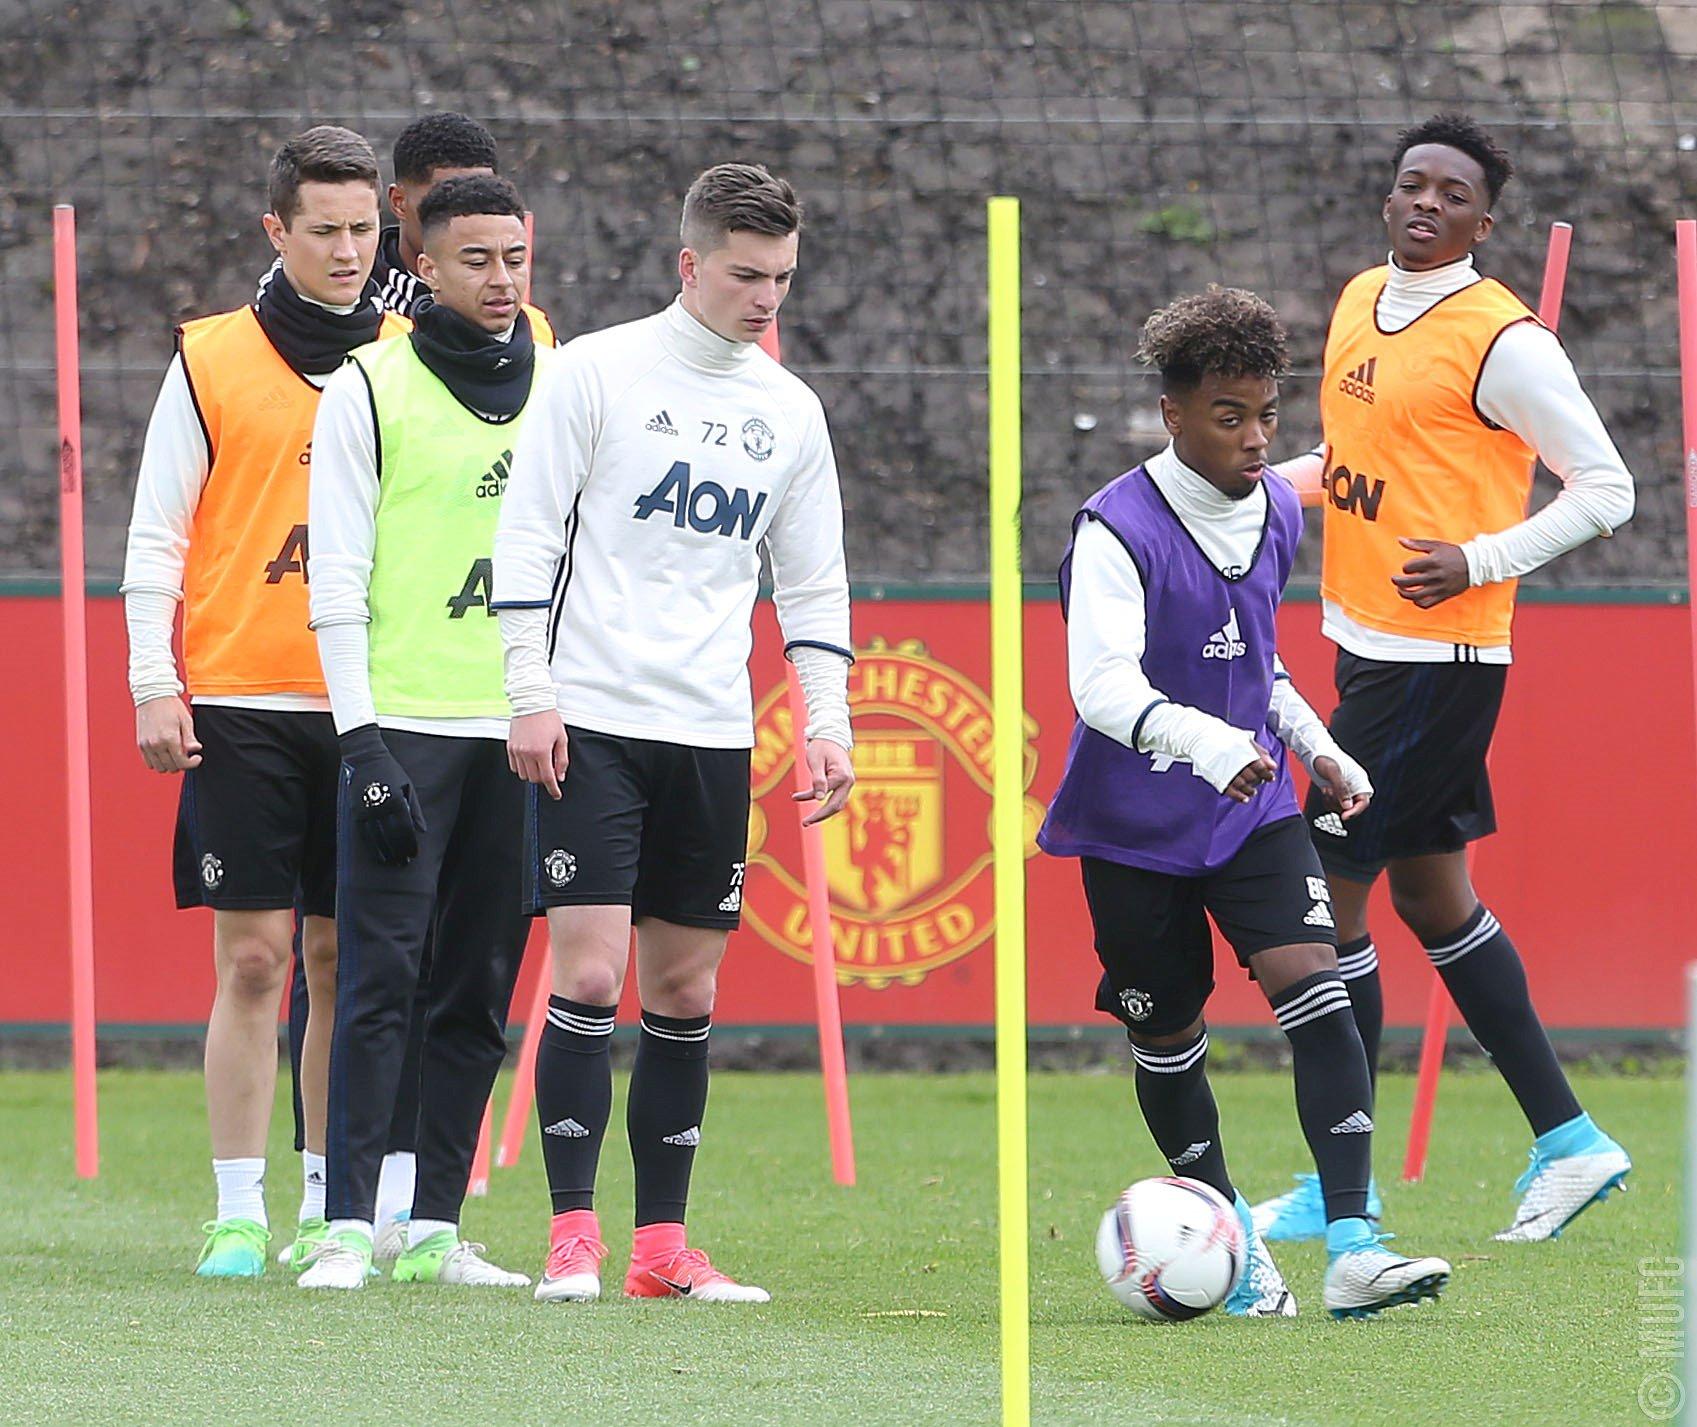 Mourinho To Play Pogba, Youngsters Vs Palace; Slams Critics' 'Lies'